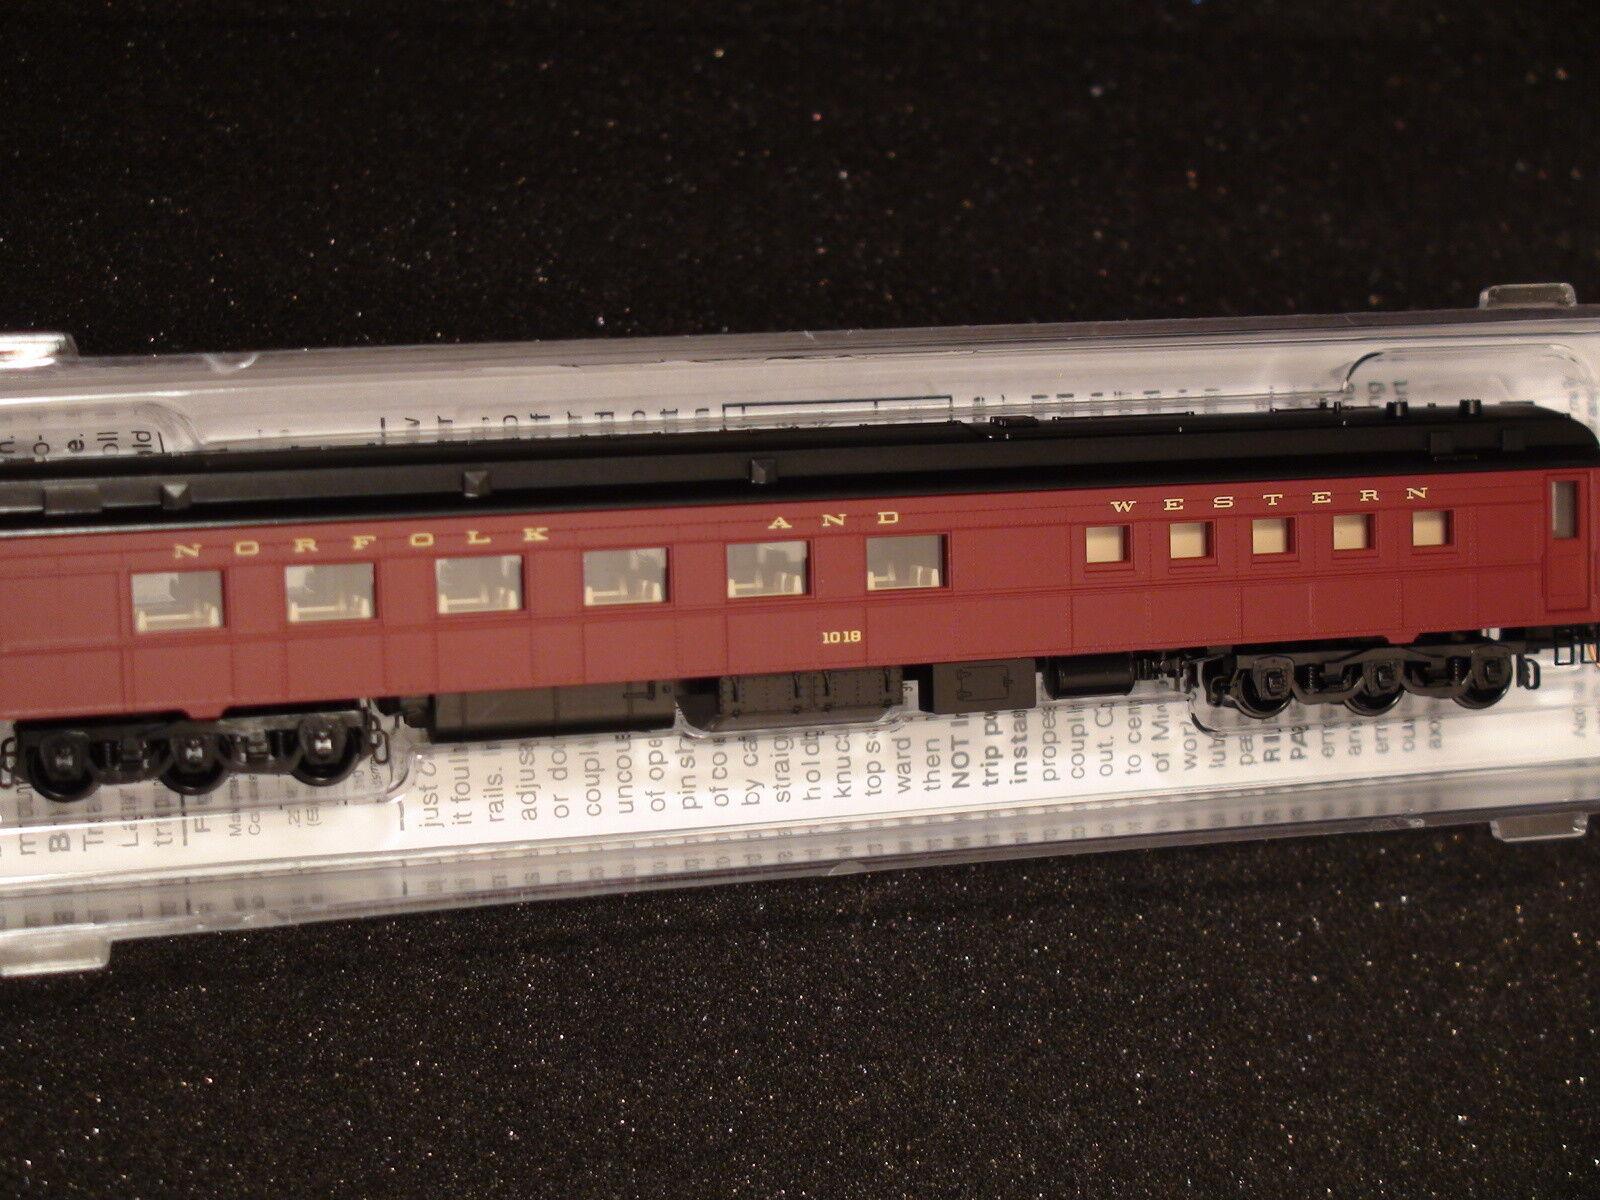 MICRO-TRAINS  146 00 180 NORFOLK & WESTERN DINER HEAVYWEIGHT CAR